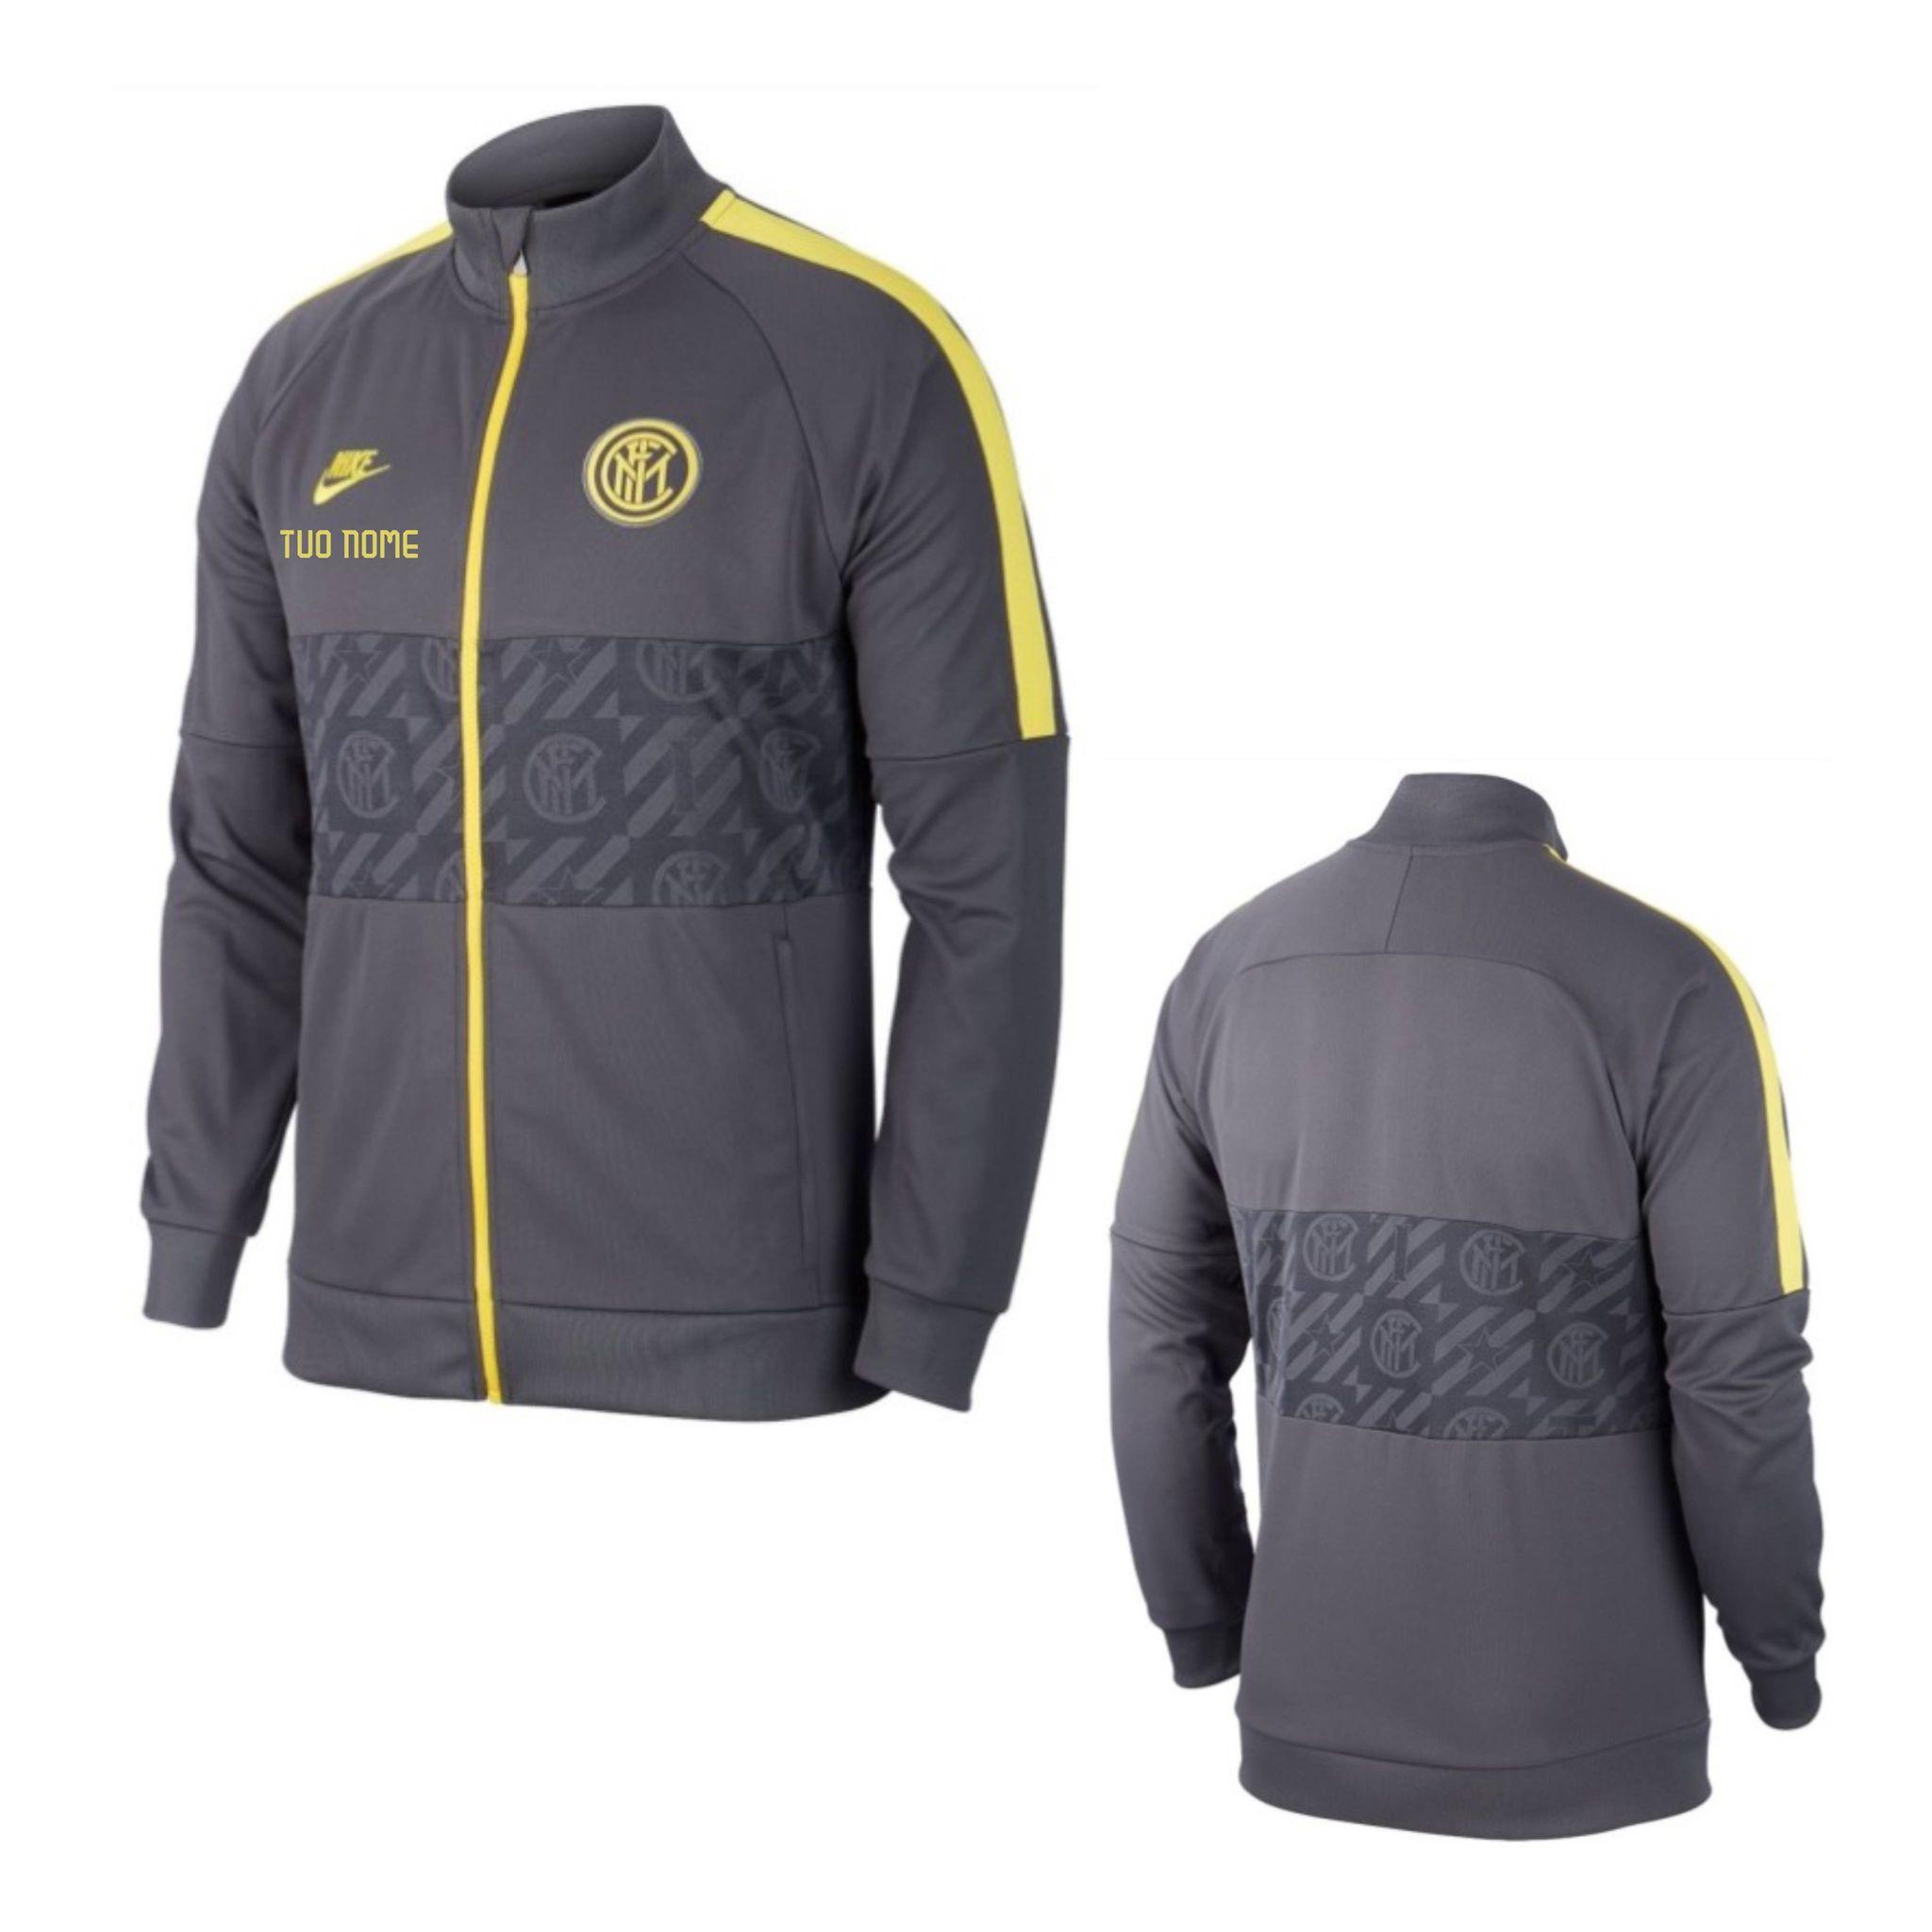 Felpa Rappresentanza Zip Europa Ufficiale Nike F.C. Inter